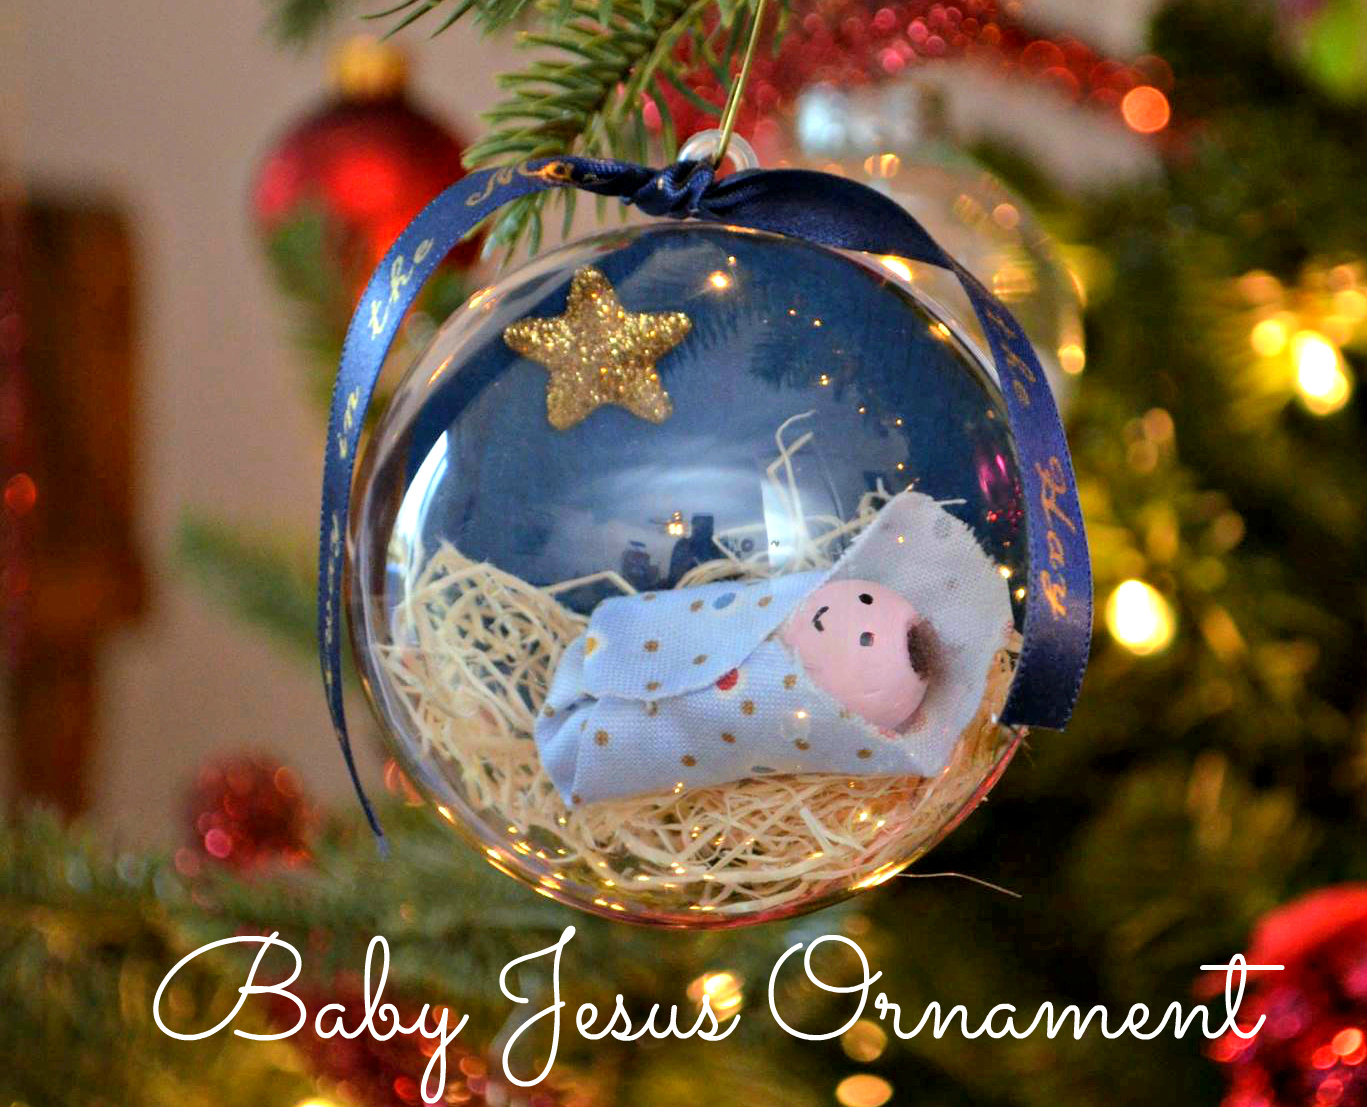 Nativity Snowman Ornament Manger Nativity Snowman Ornament Mary Ornament Baby Jesus Ornament  First Christmas Ornament Custom  Personalized